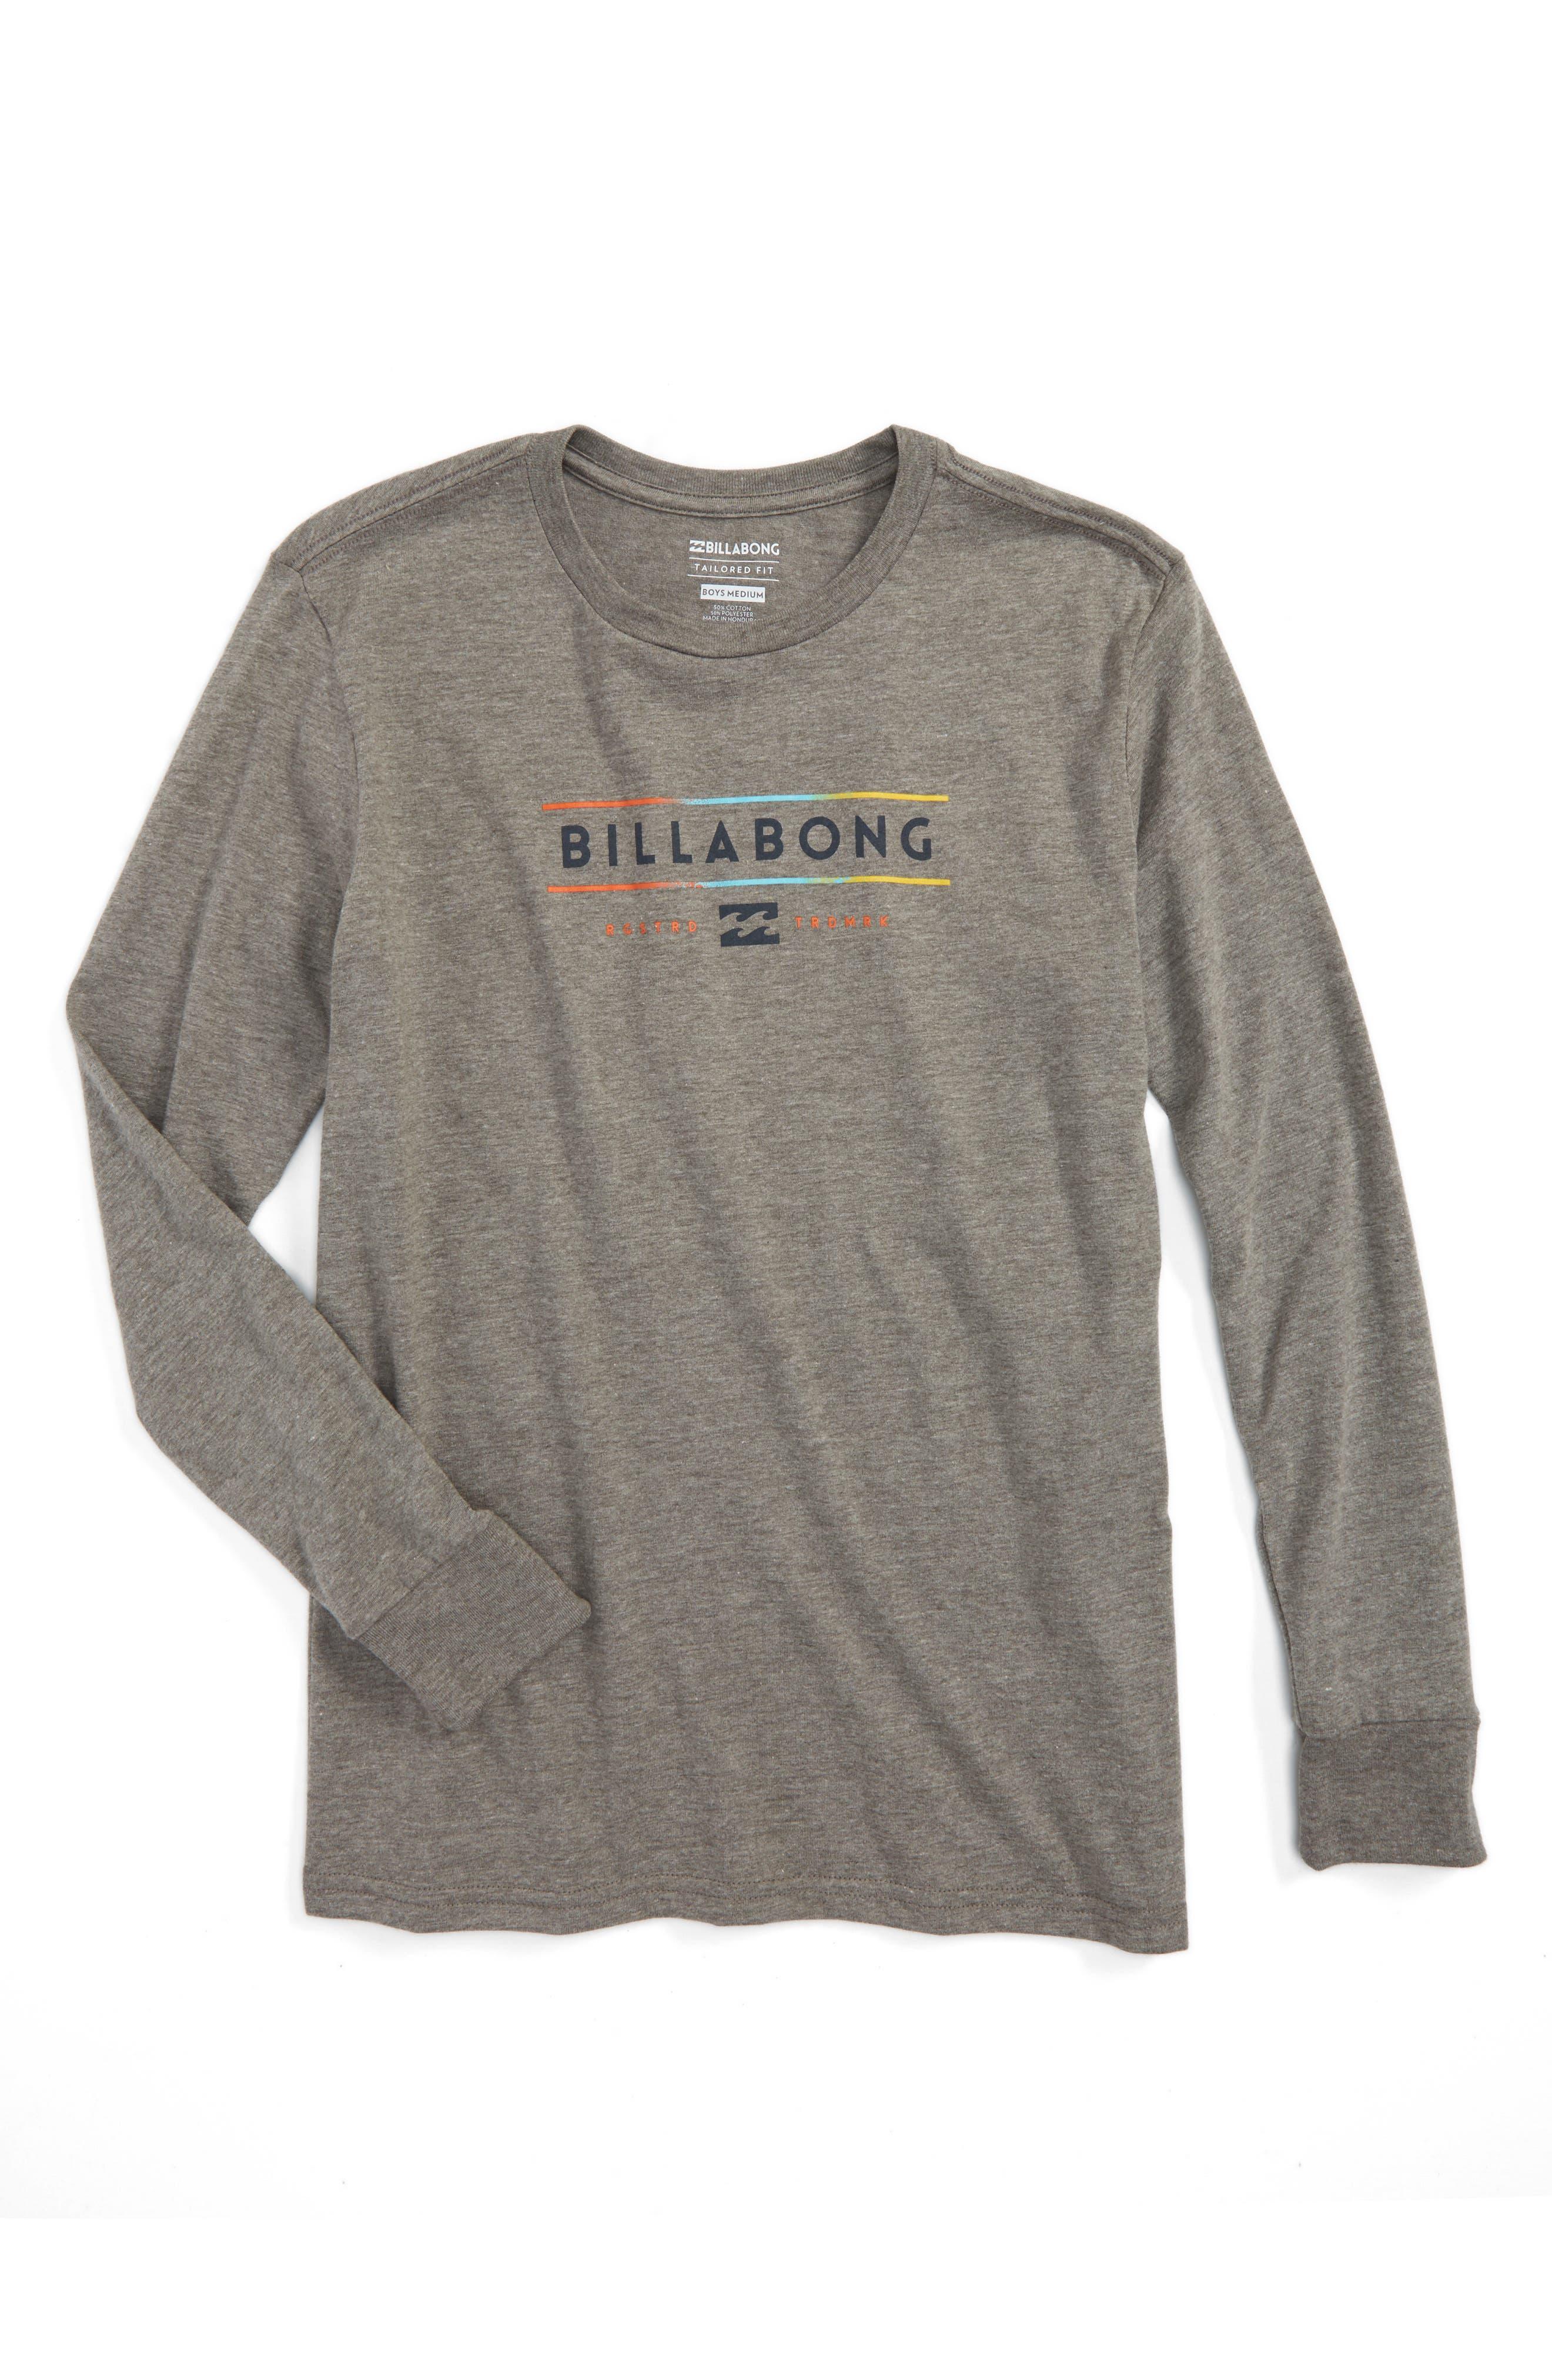 Billabong Dual Unity Long Sleeve T-Shirt (Toddler Boys, Little Boys & Big Boys)